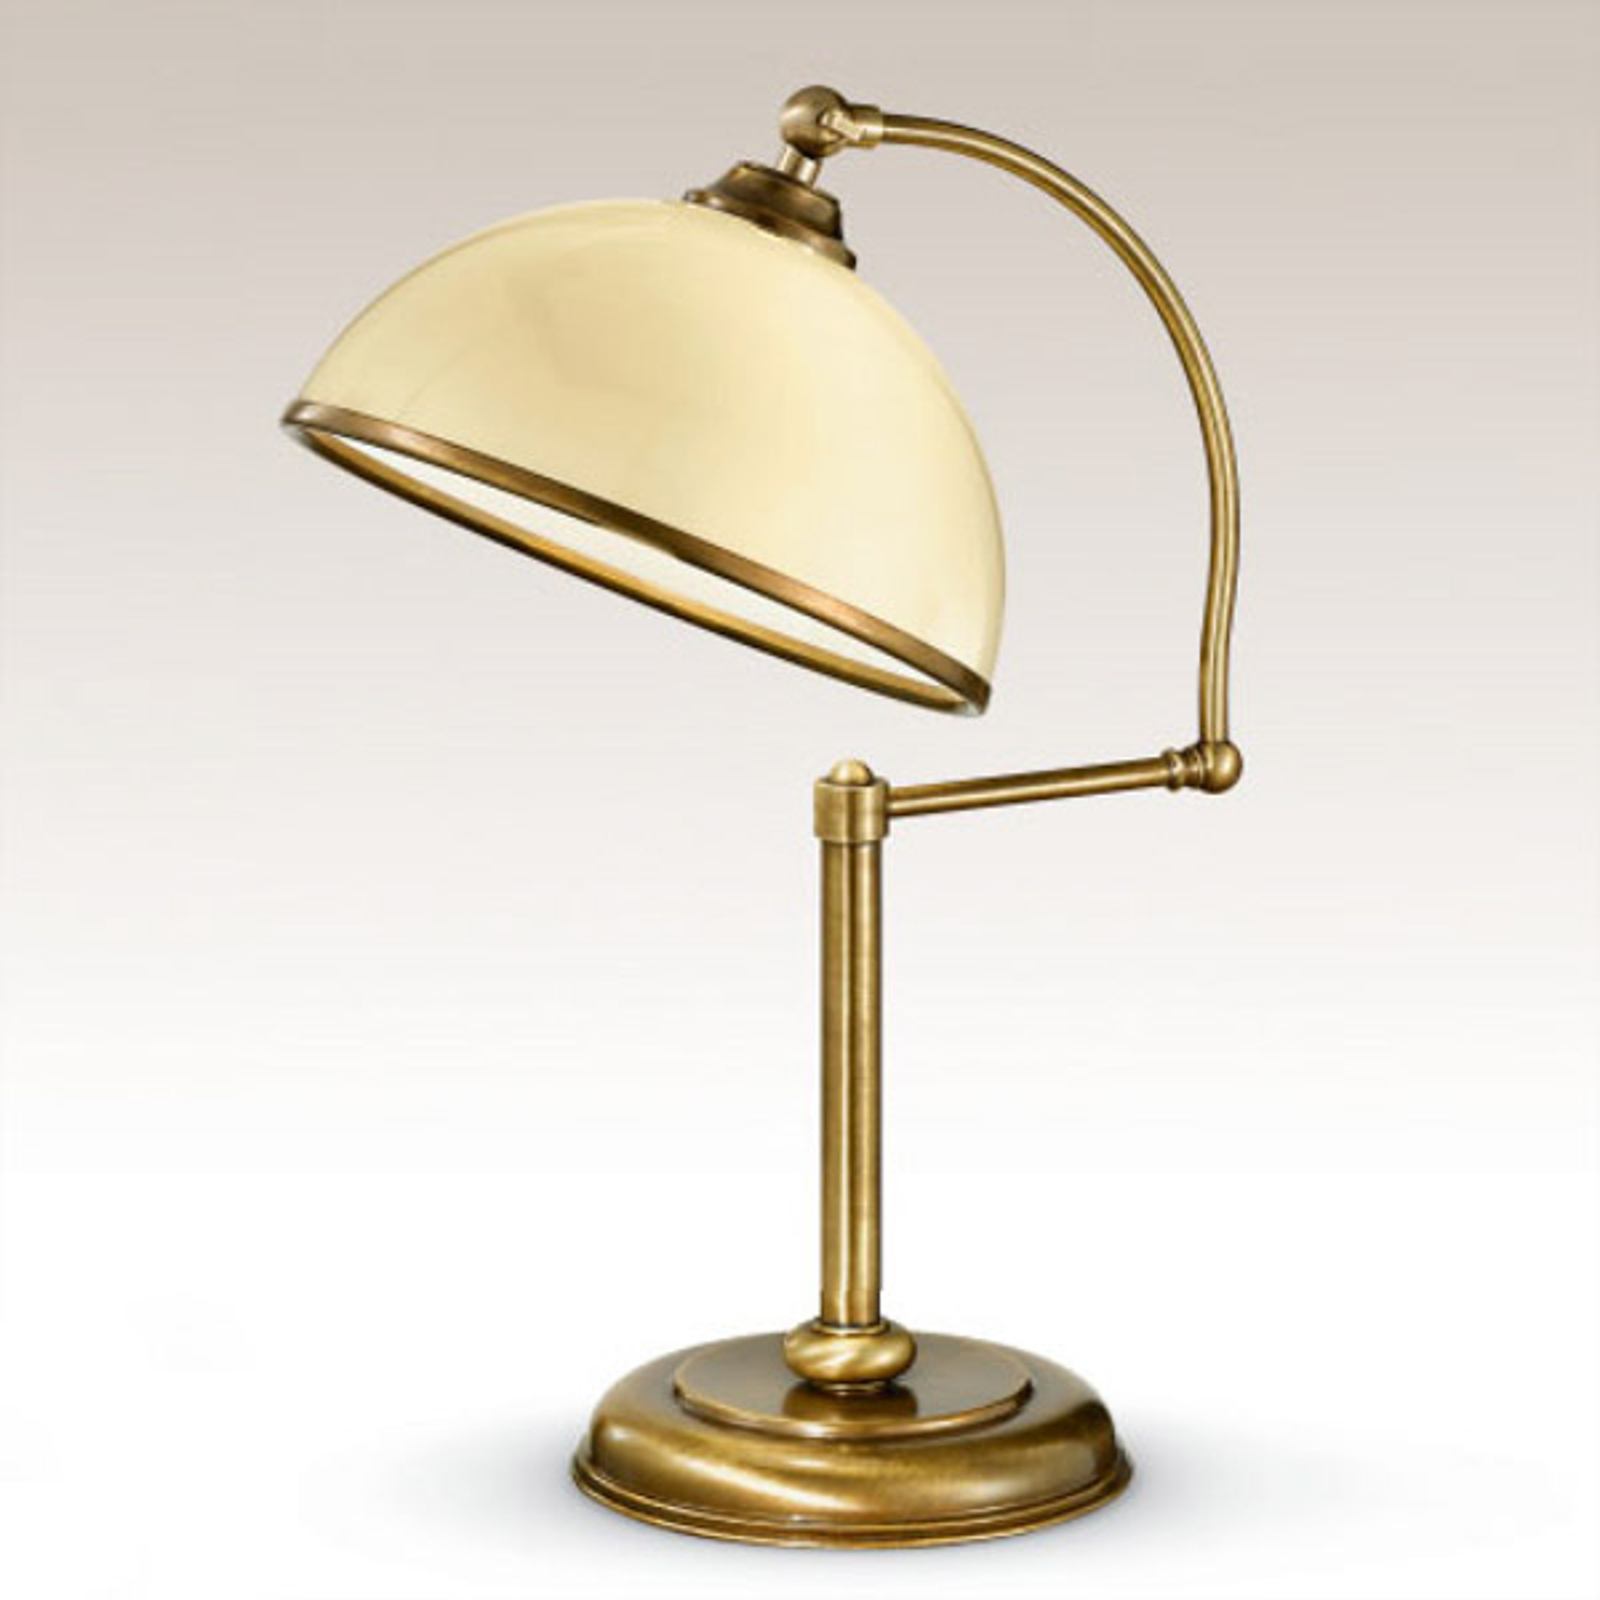 Riktbar bordslampa La Botte, elfenbensvit